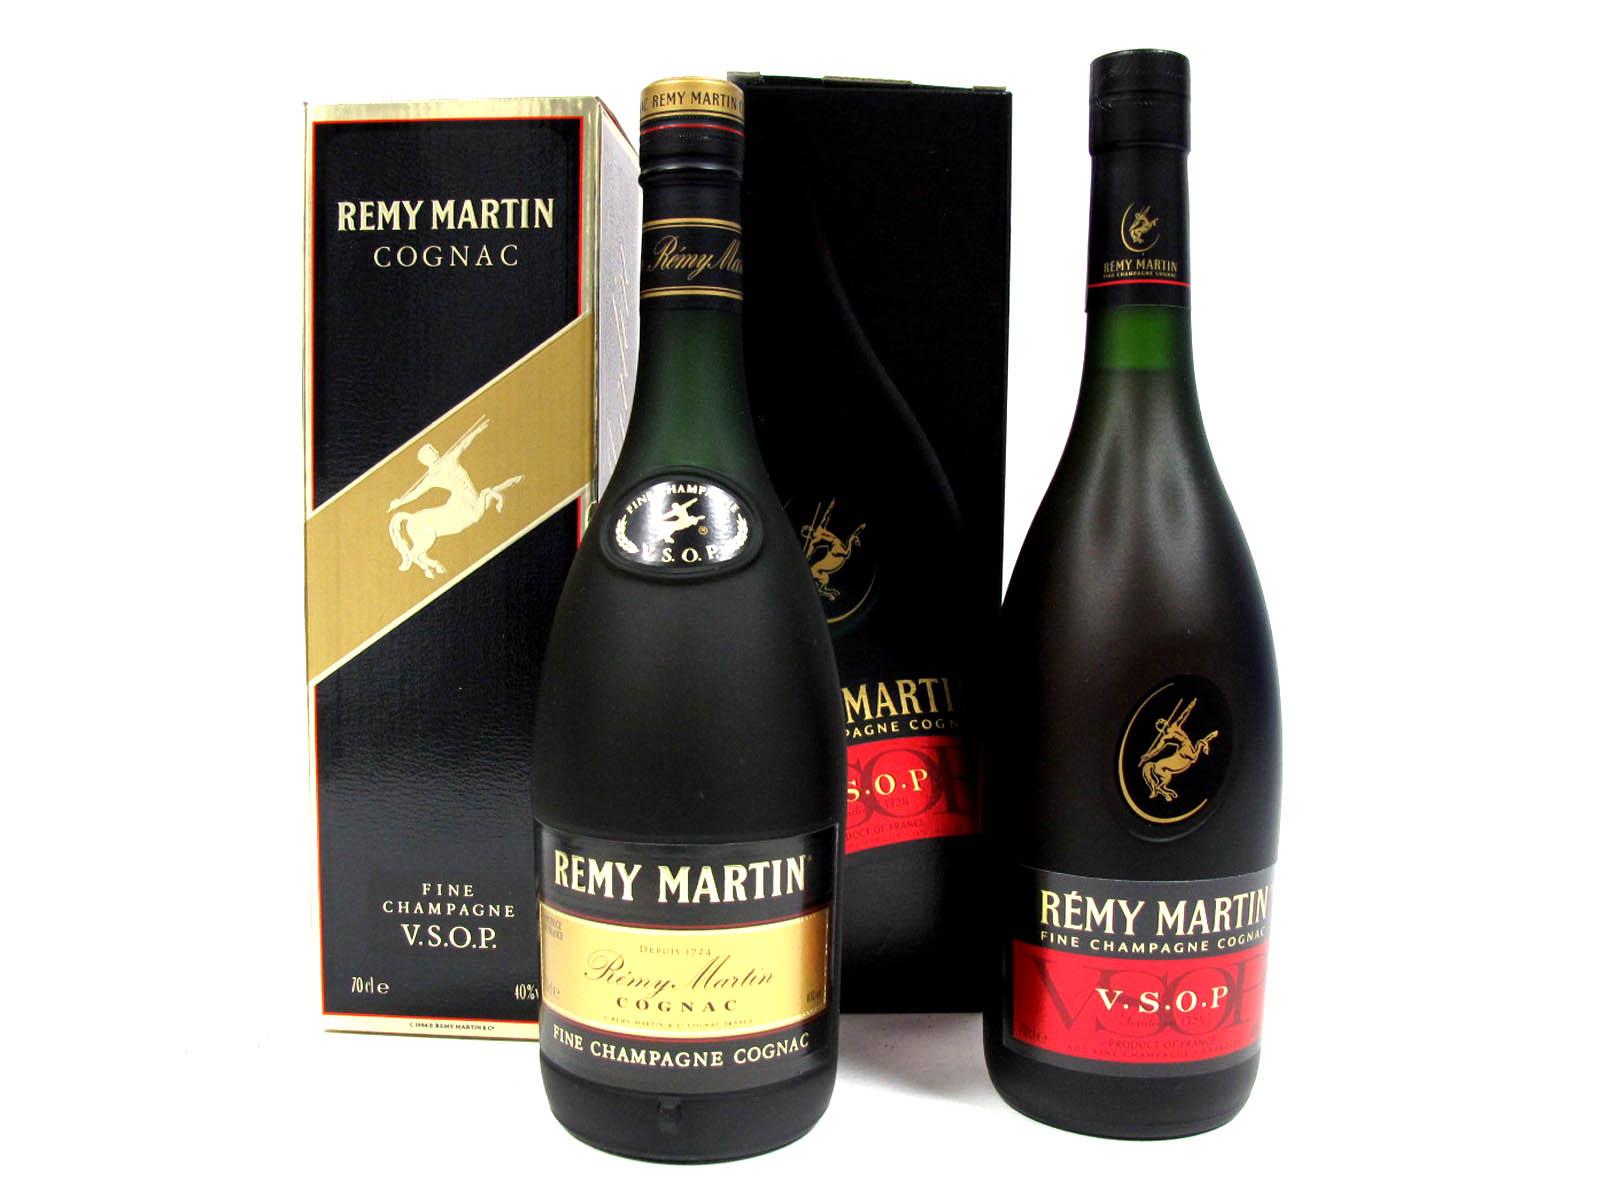 Lot 48 - Spirits - Remy Martin Fine Champagne V.S.O.P. Cognac, 70cl, 40% Vol., boxed. (2)